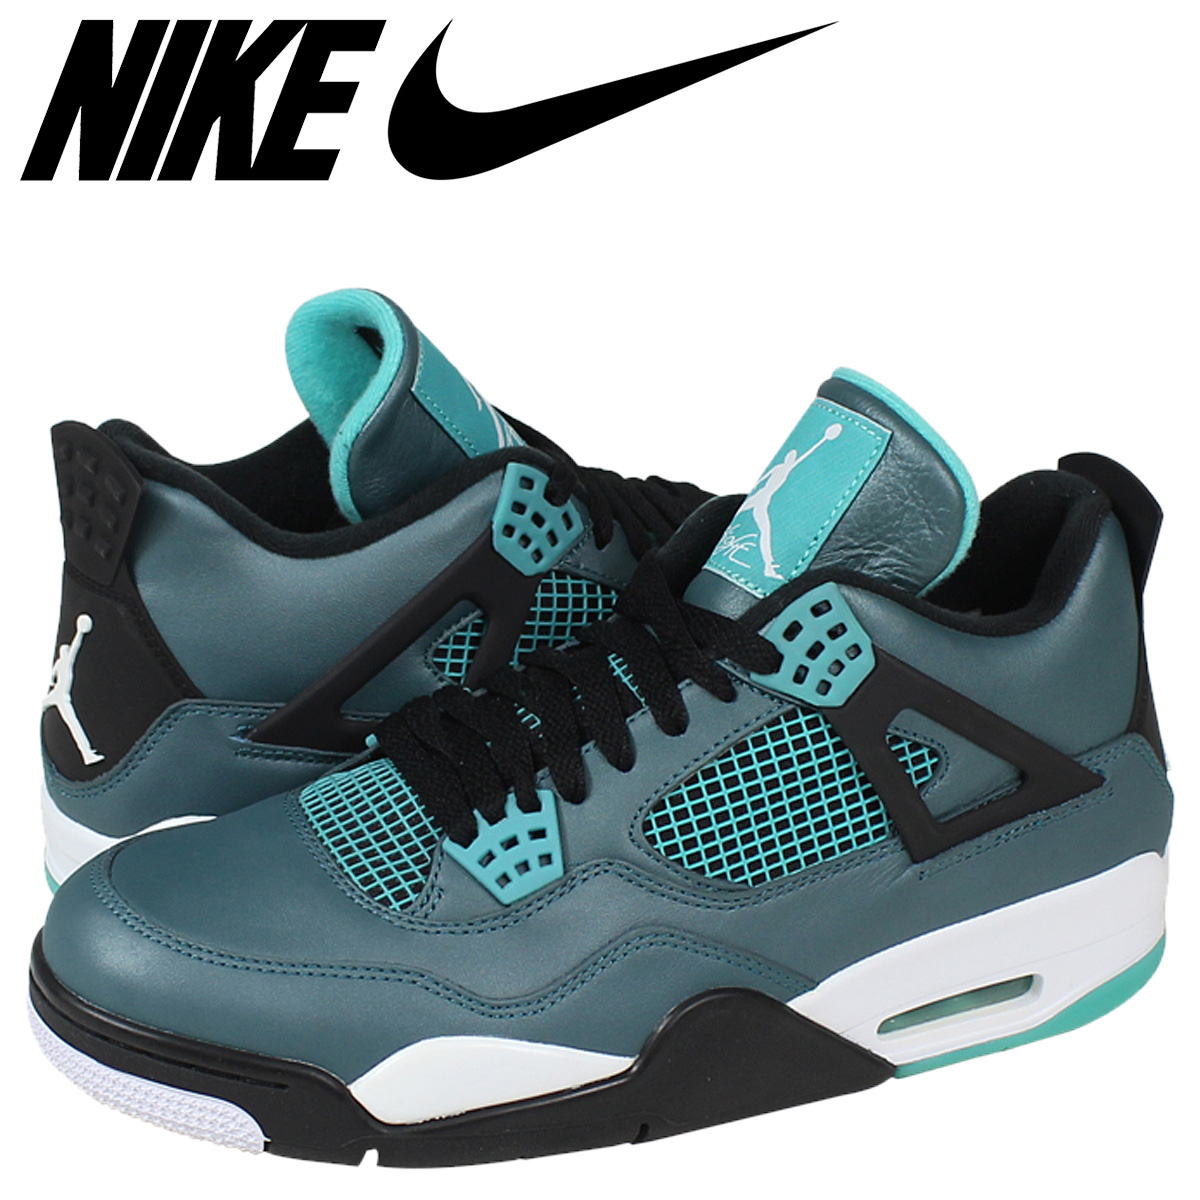 c6172ba3f4e613 Nike NIKE Air Jordan sneakers AIR JORDAN 4 RETRO 30TH Air Jordan 4 30  anniversary of 705331-330 green mens